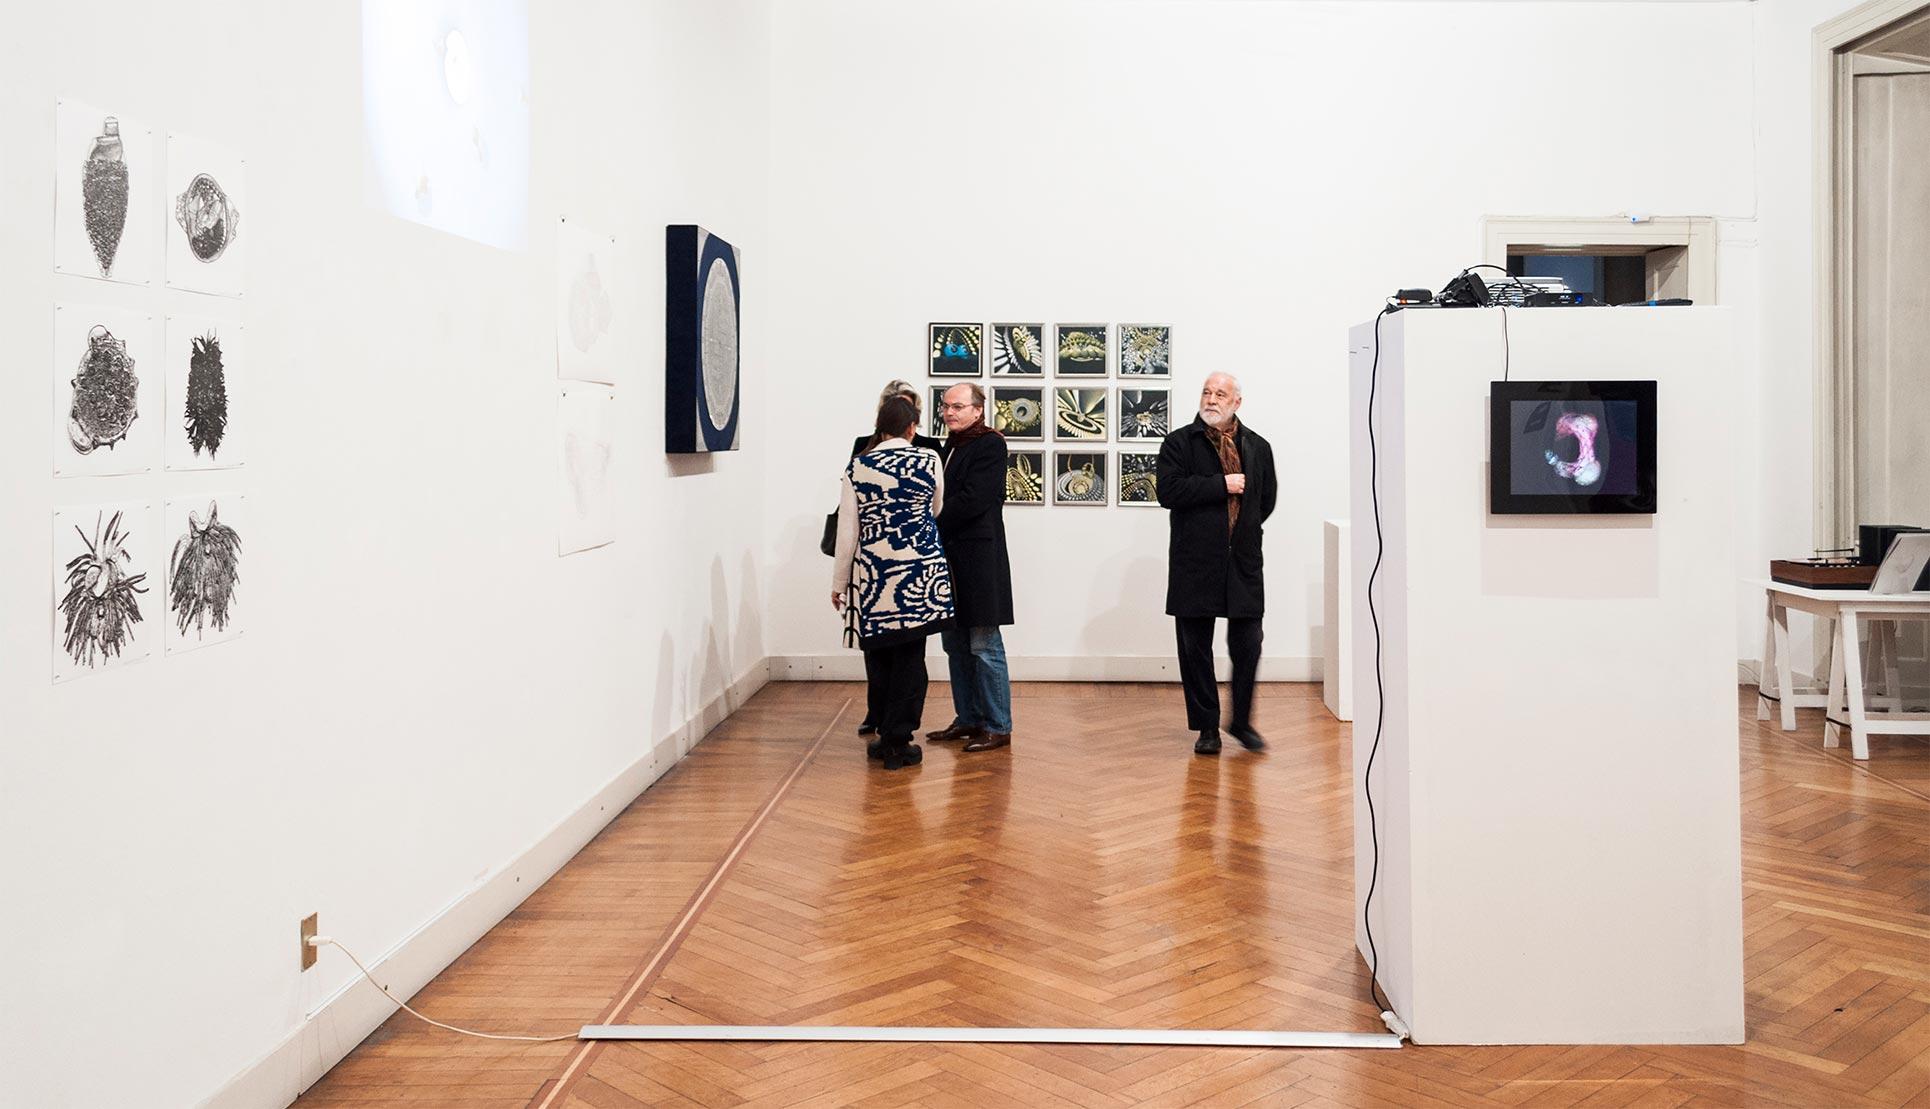 Genera view Galleria Milano (Photo: Elenia Megna)